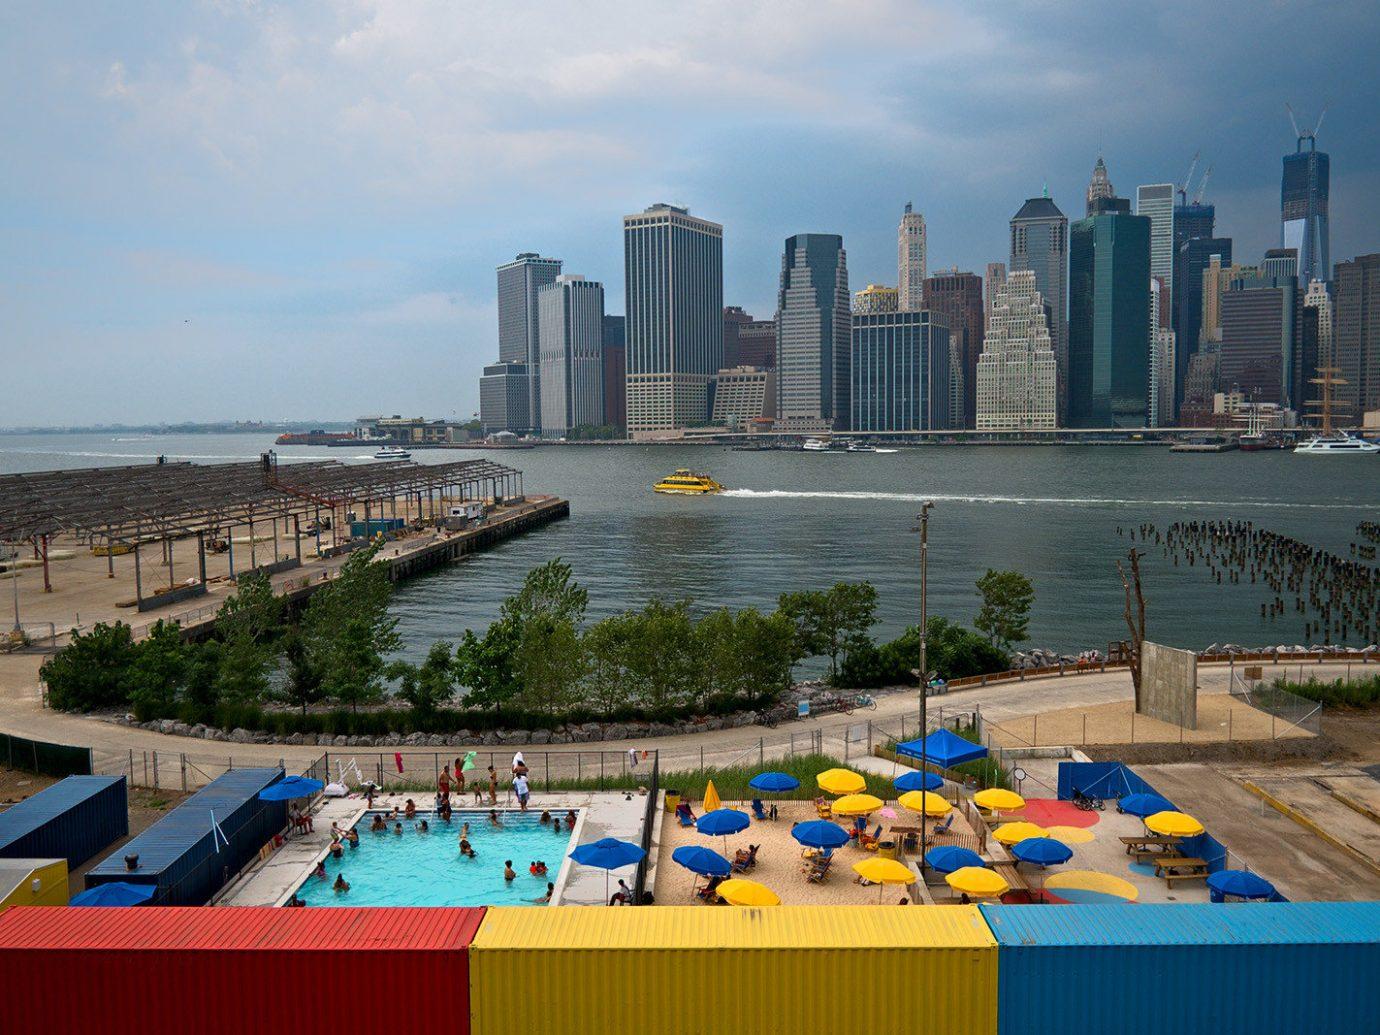 Offbeat sky outdoor City human settlement skyline vacation tourism Beach Downtown Sea